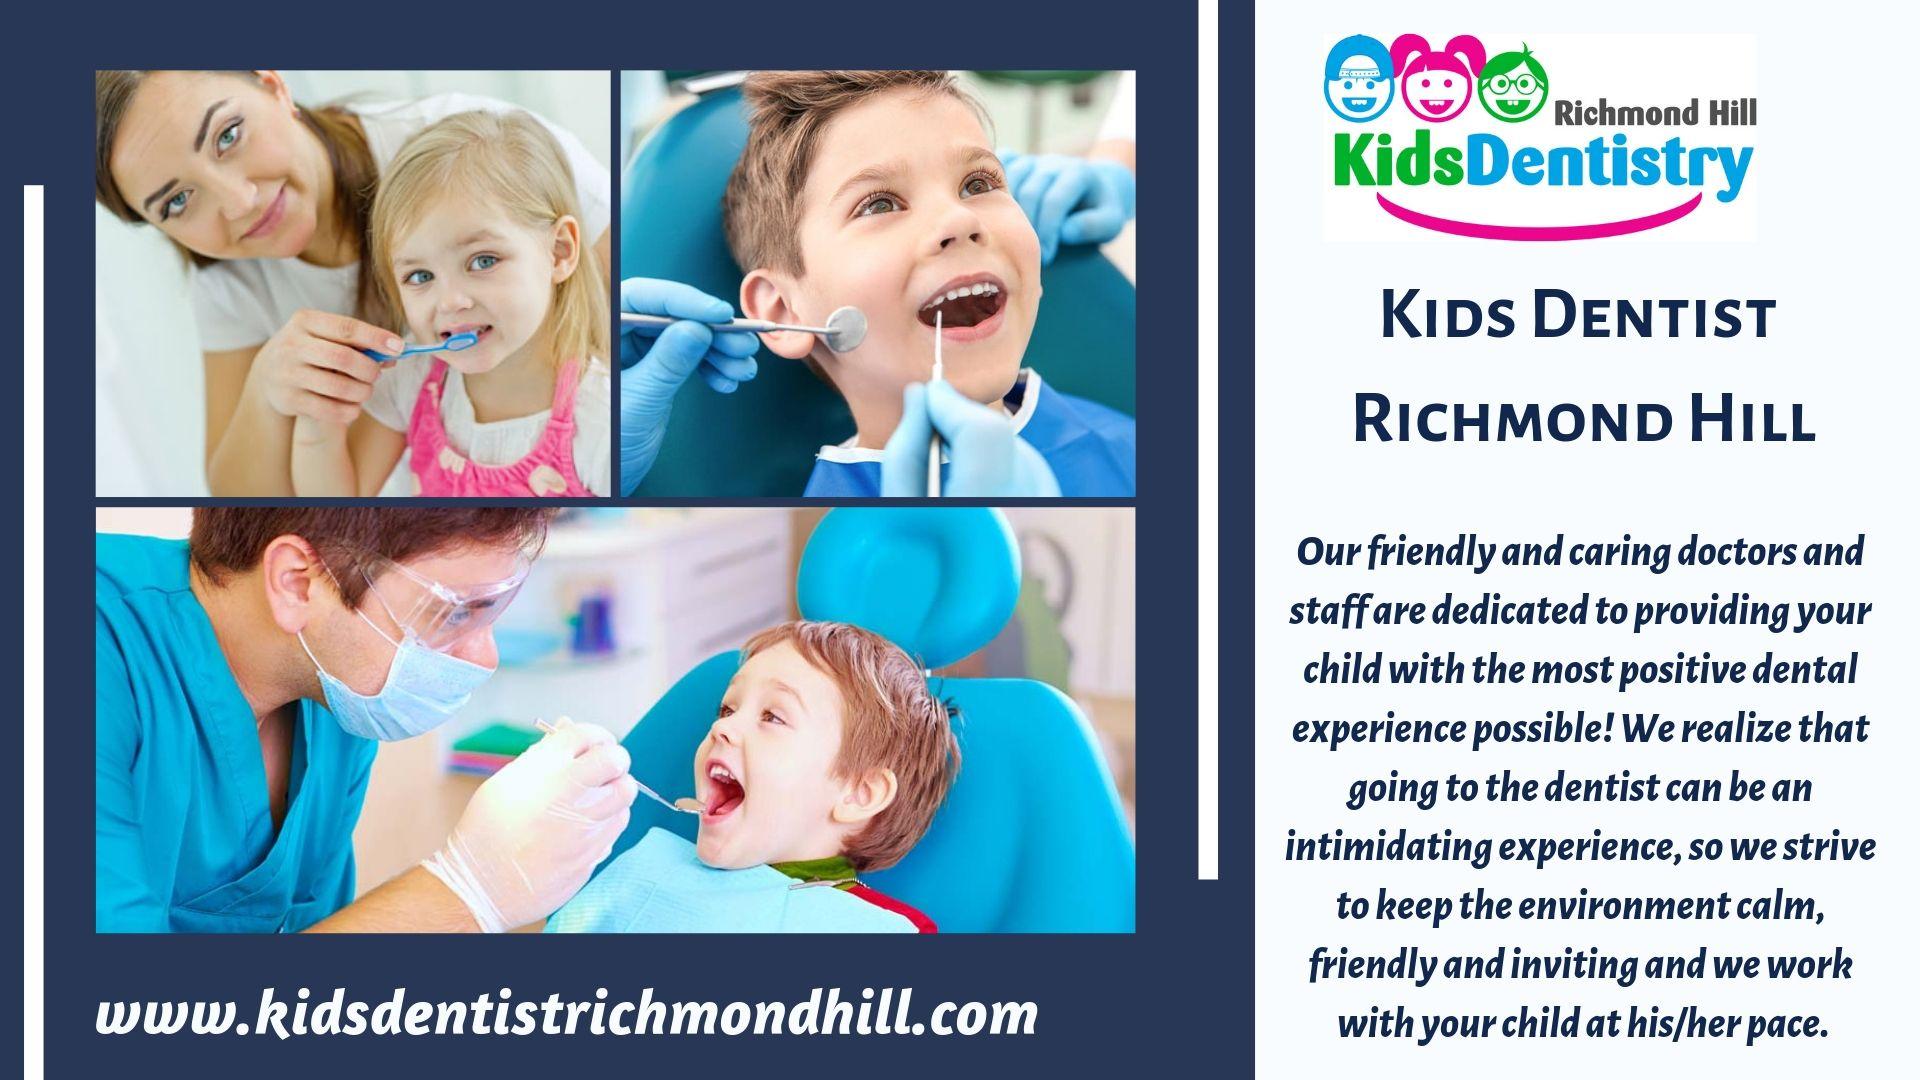 Home Kids dentist, Dental care, Pediatrics